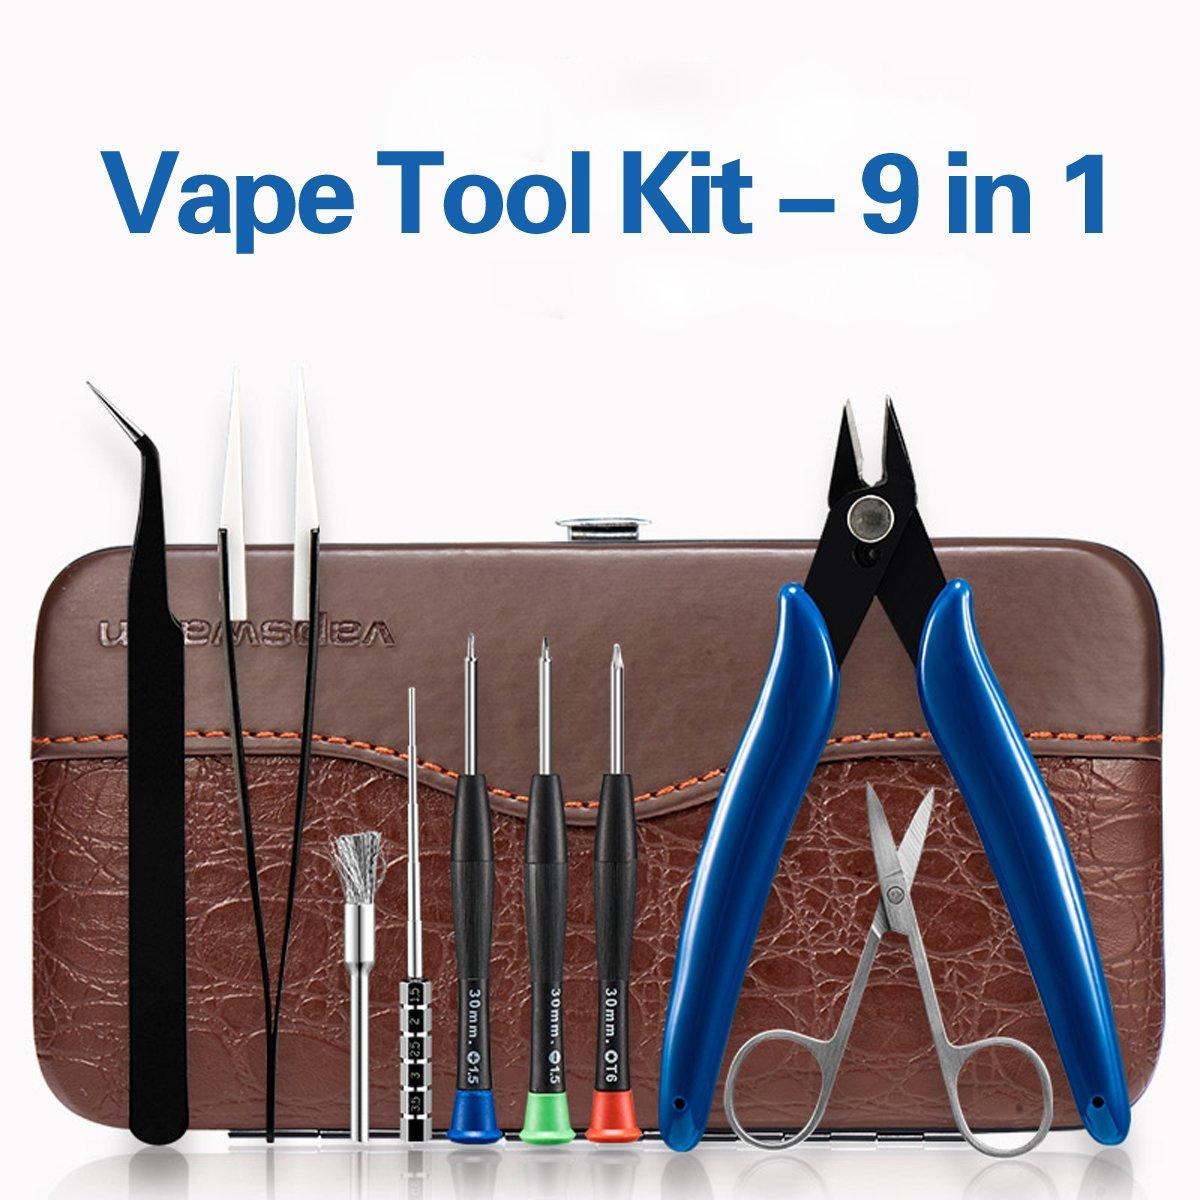 Portable Coil DIY Tool Kit Sets(9in1), Crocodile Skin PU Leather Storage Bag Oblique Pliers Ceramic/Elbow Tweezers Wire Rod Elbow Scissors Cross (Plum) / Word / T6 (Hexagon) Screwdriver Steel Brush